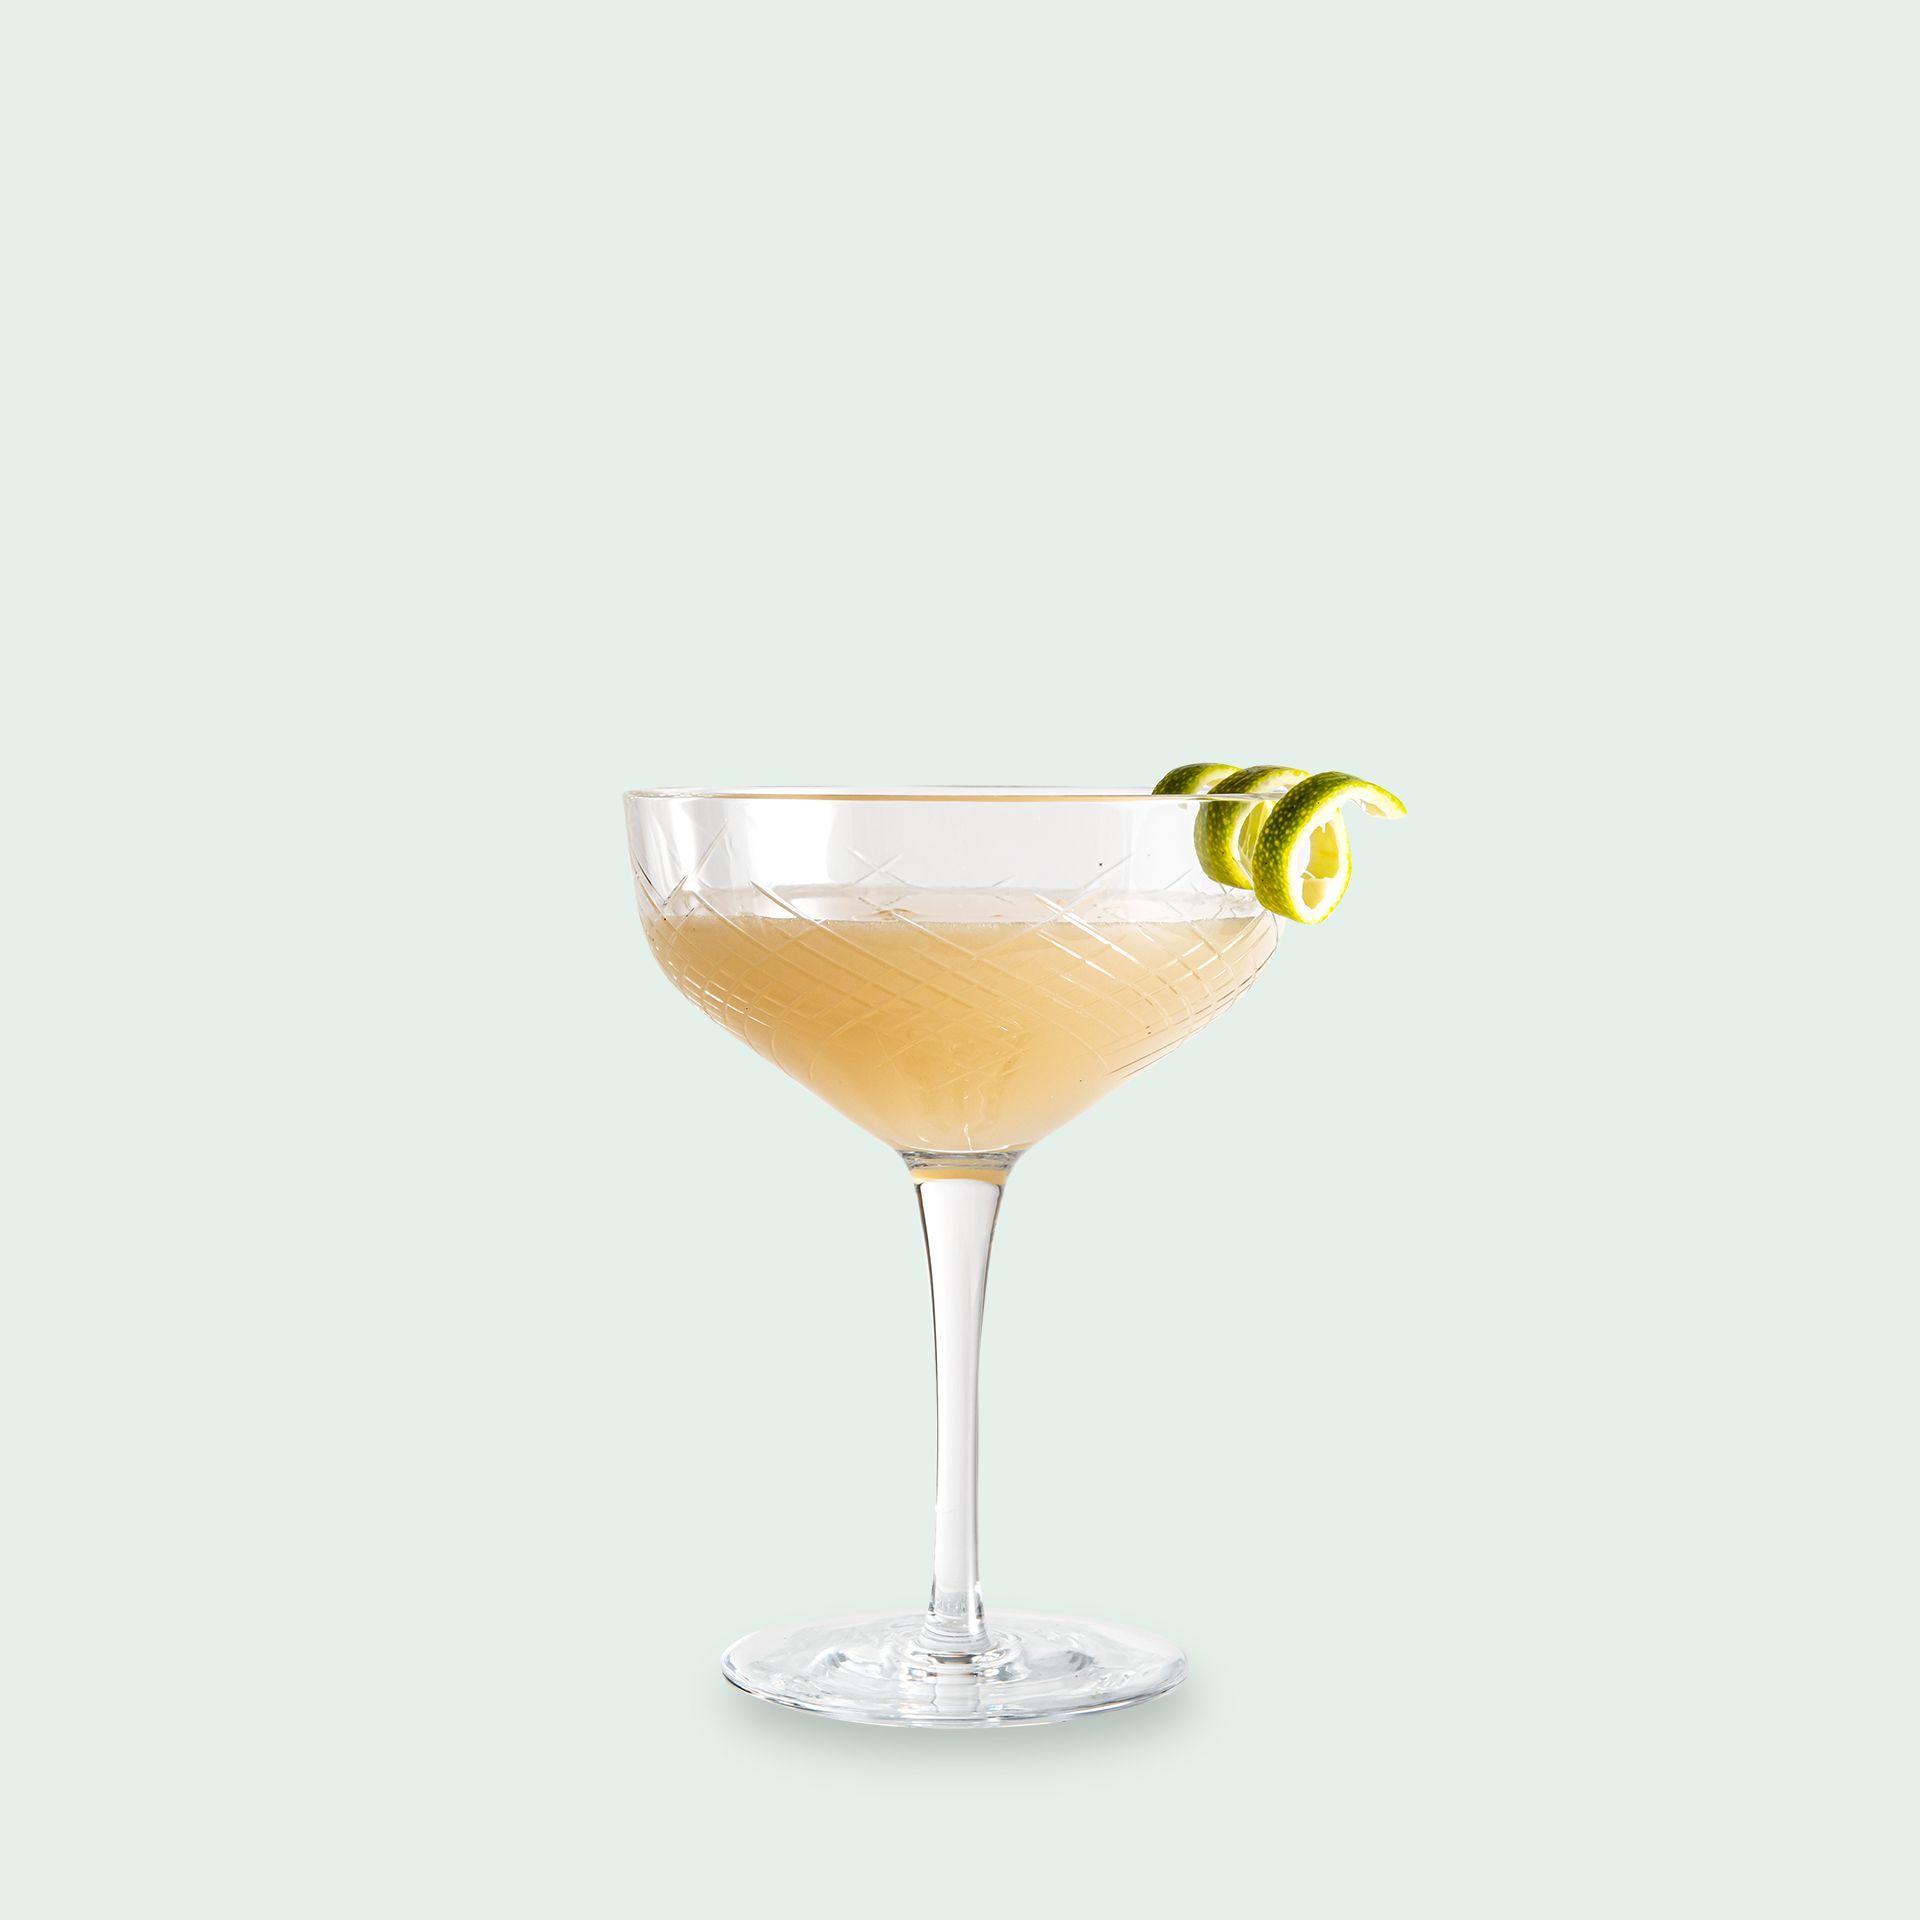 Helsinki Gin Likööri: Tyrni Margarita